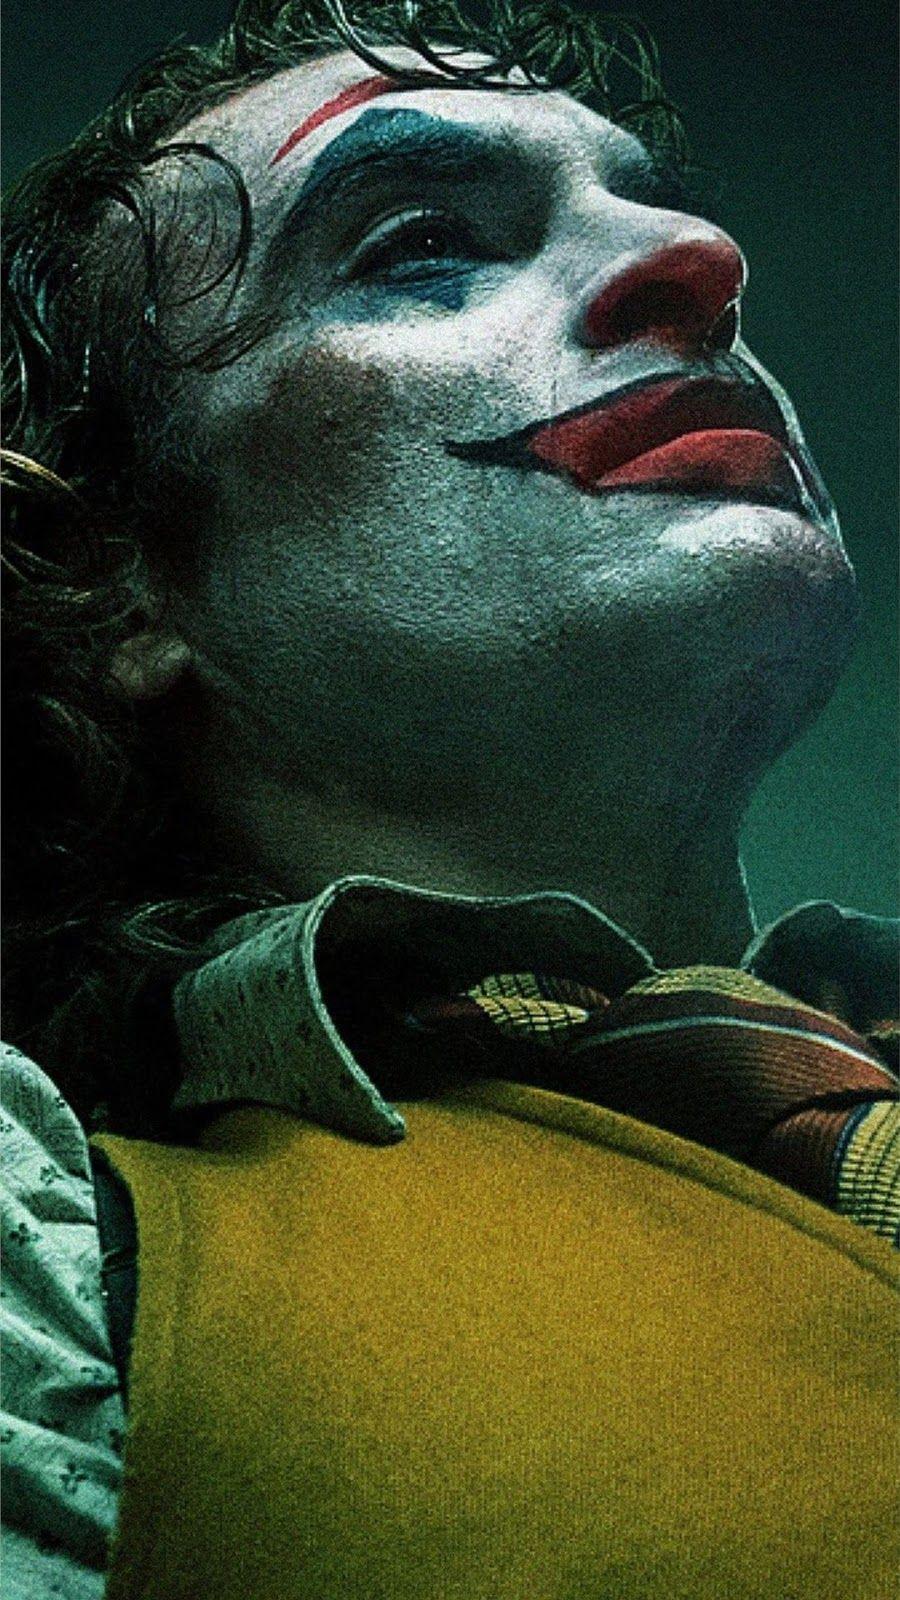 Cool Joker Hd Wallpaper For Iphone 7 Plus Images Joker Hd Wallpaper Joker Wallpapers Joker Iphone Wallpaper